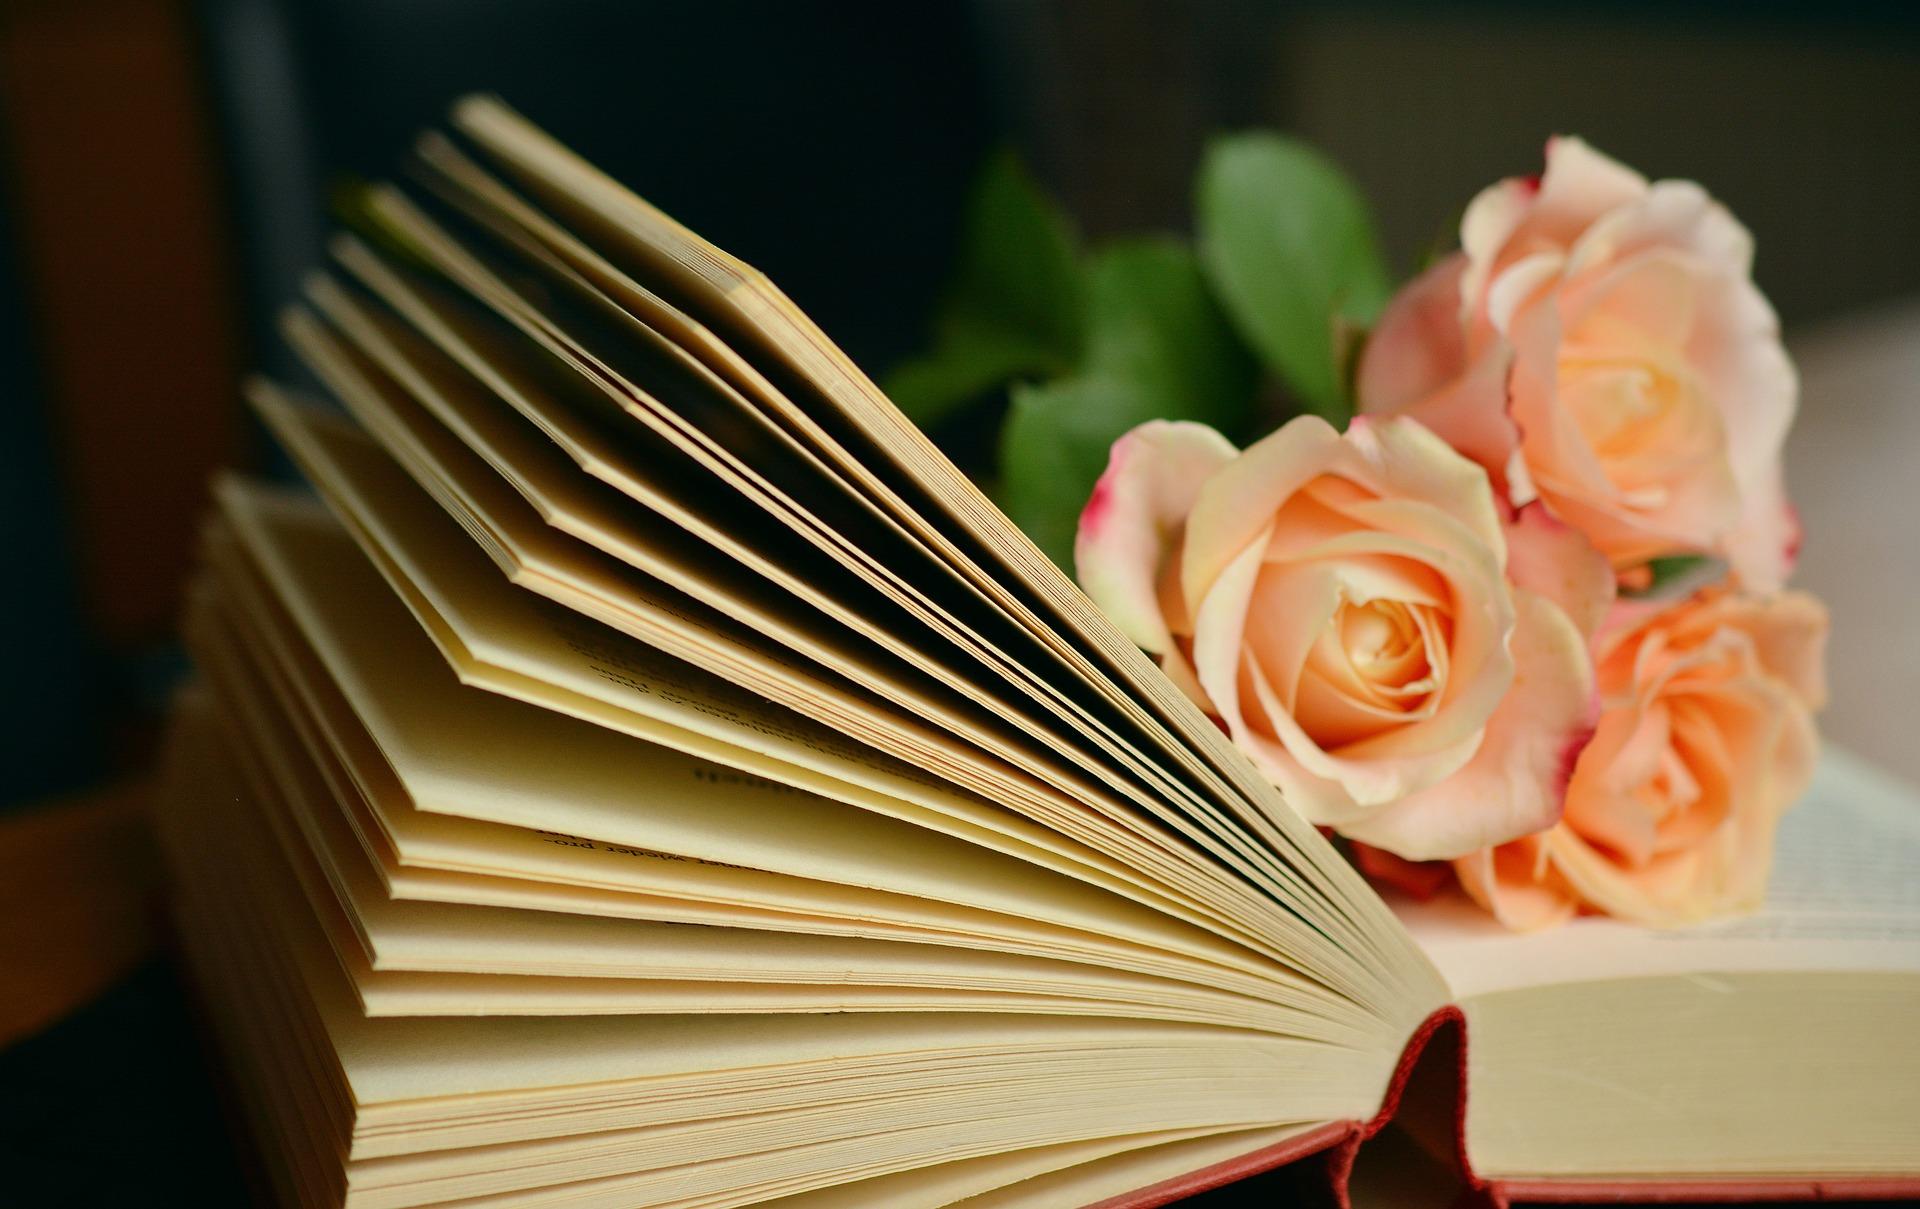 livre-ouvert-roses